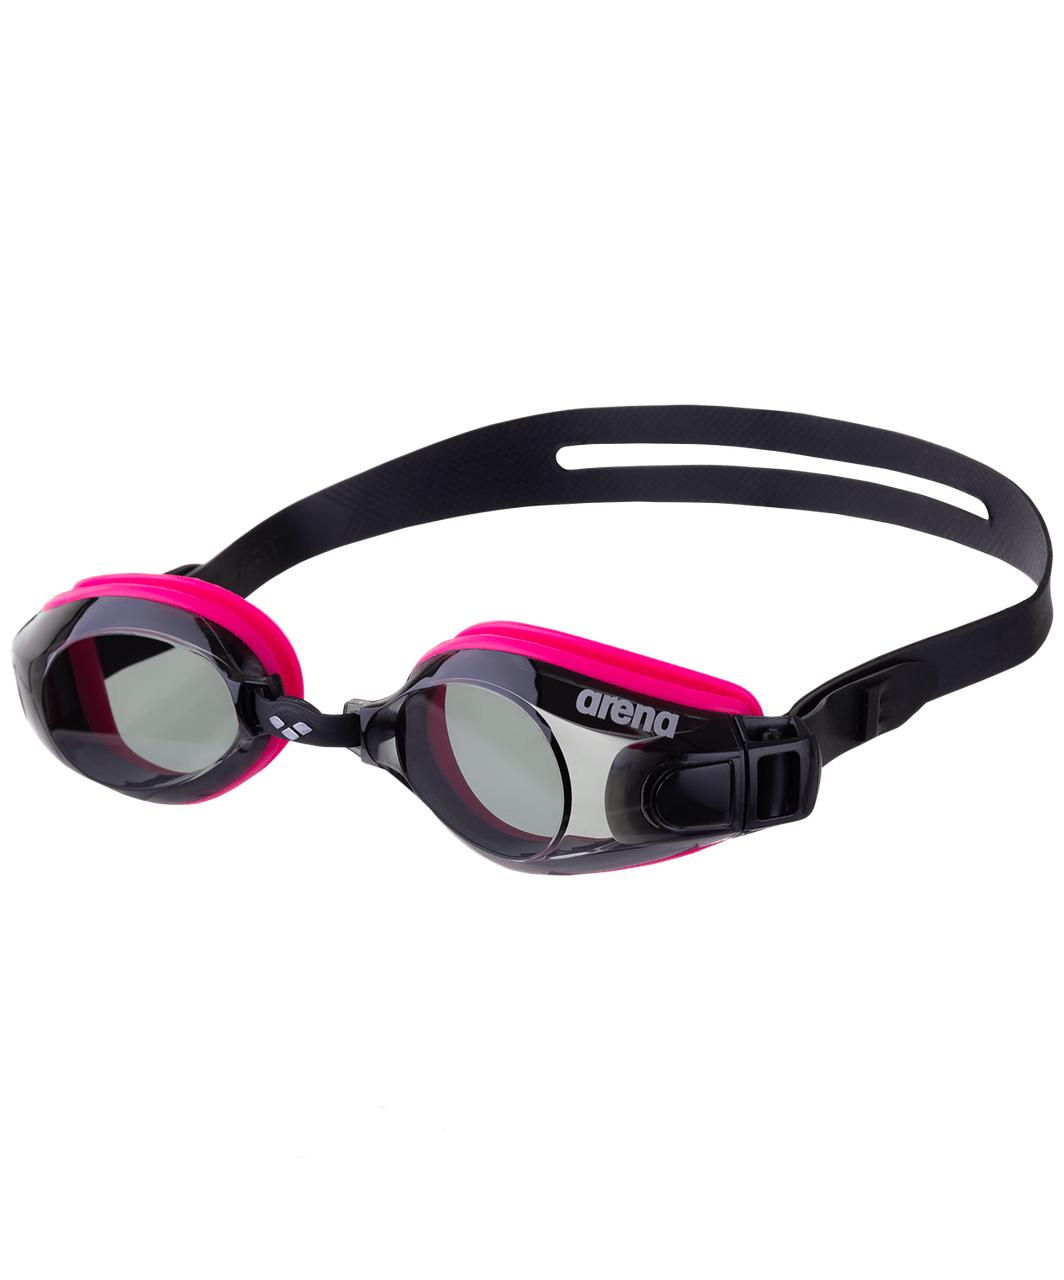 Очки Arena ZOOM X-FIT ( розовые, синие)